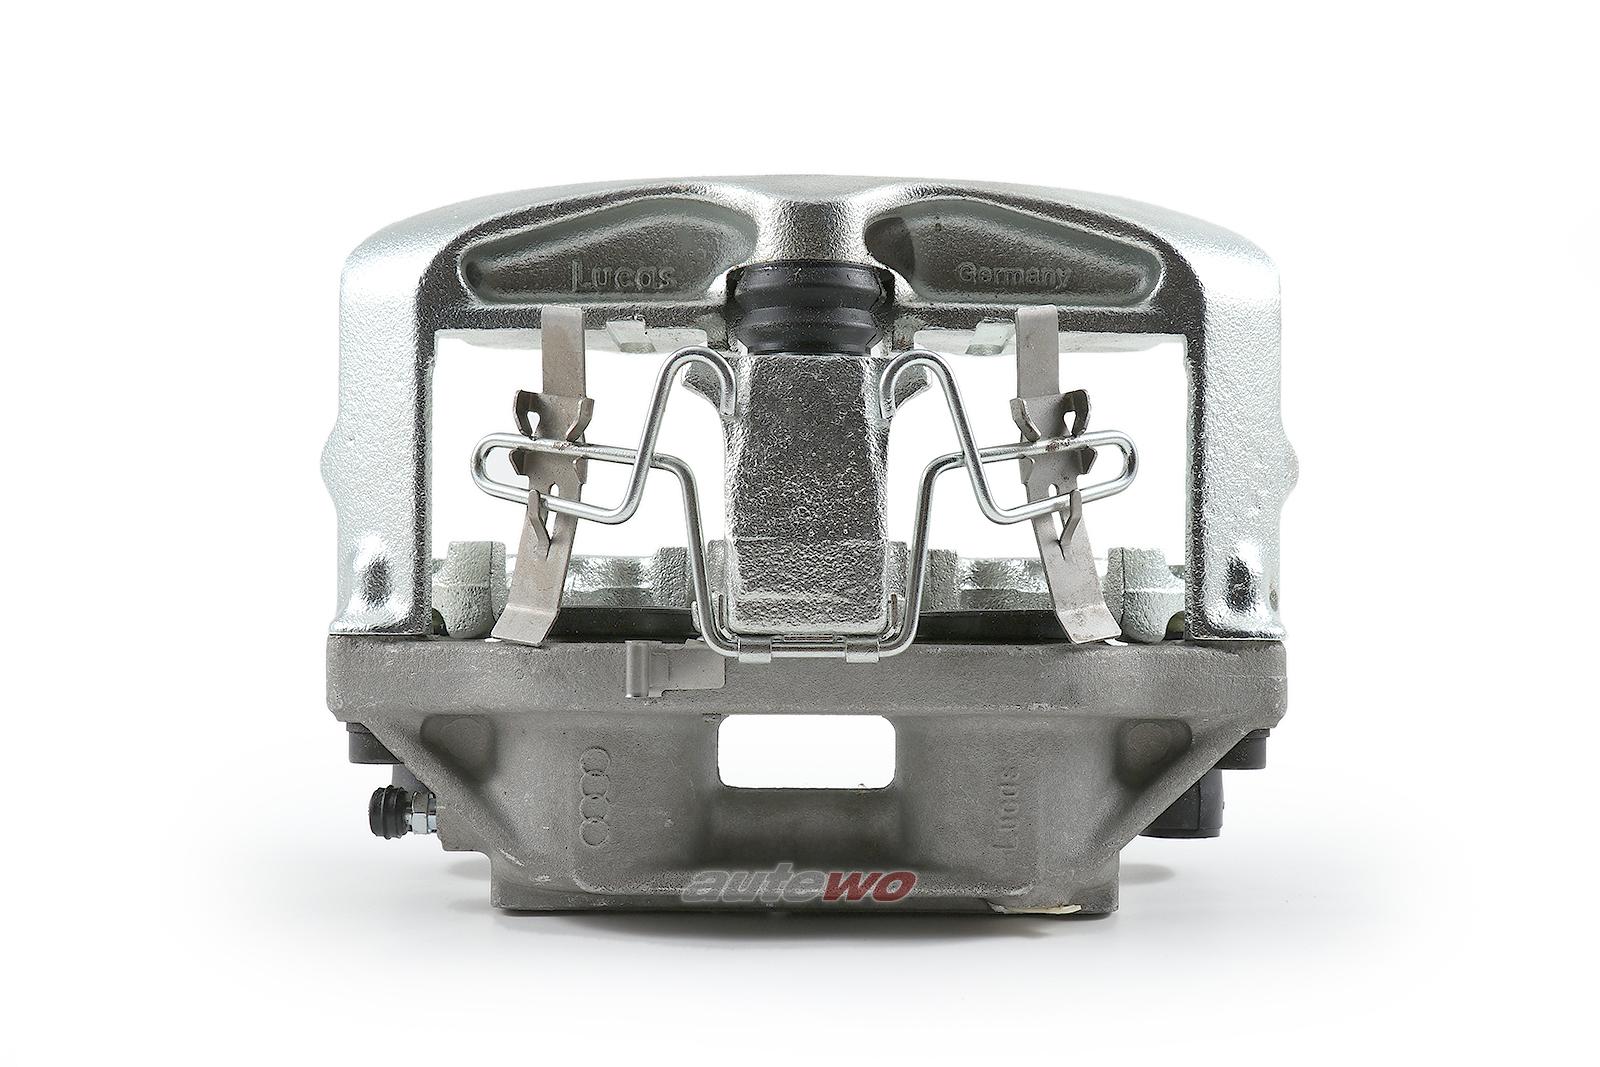 #4B0615108B Audi S4 B5/A6 4B/A8 D2 HP2 Bremssattel 323x30mm Vorne Rechts